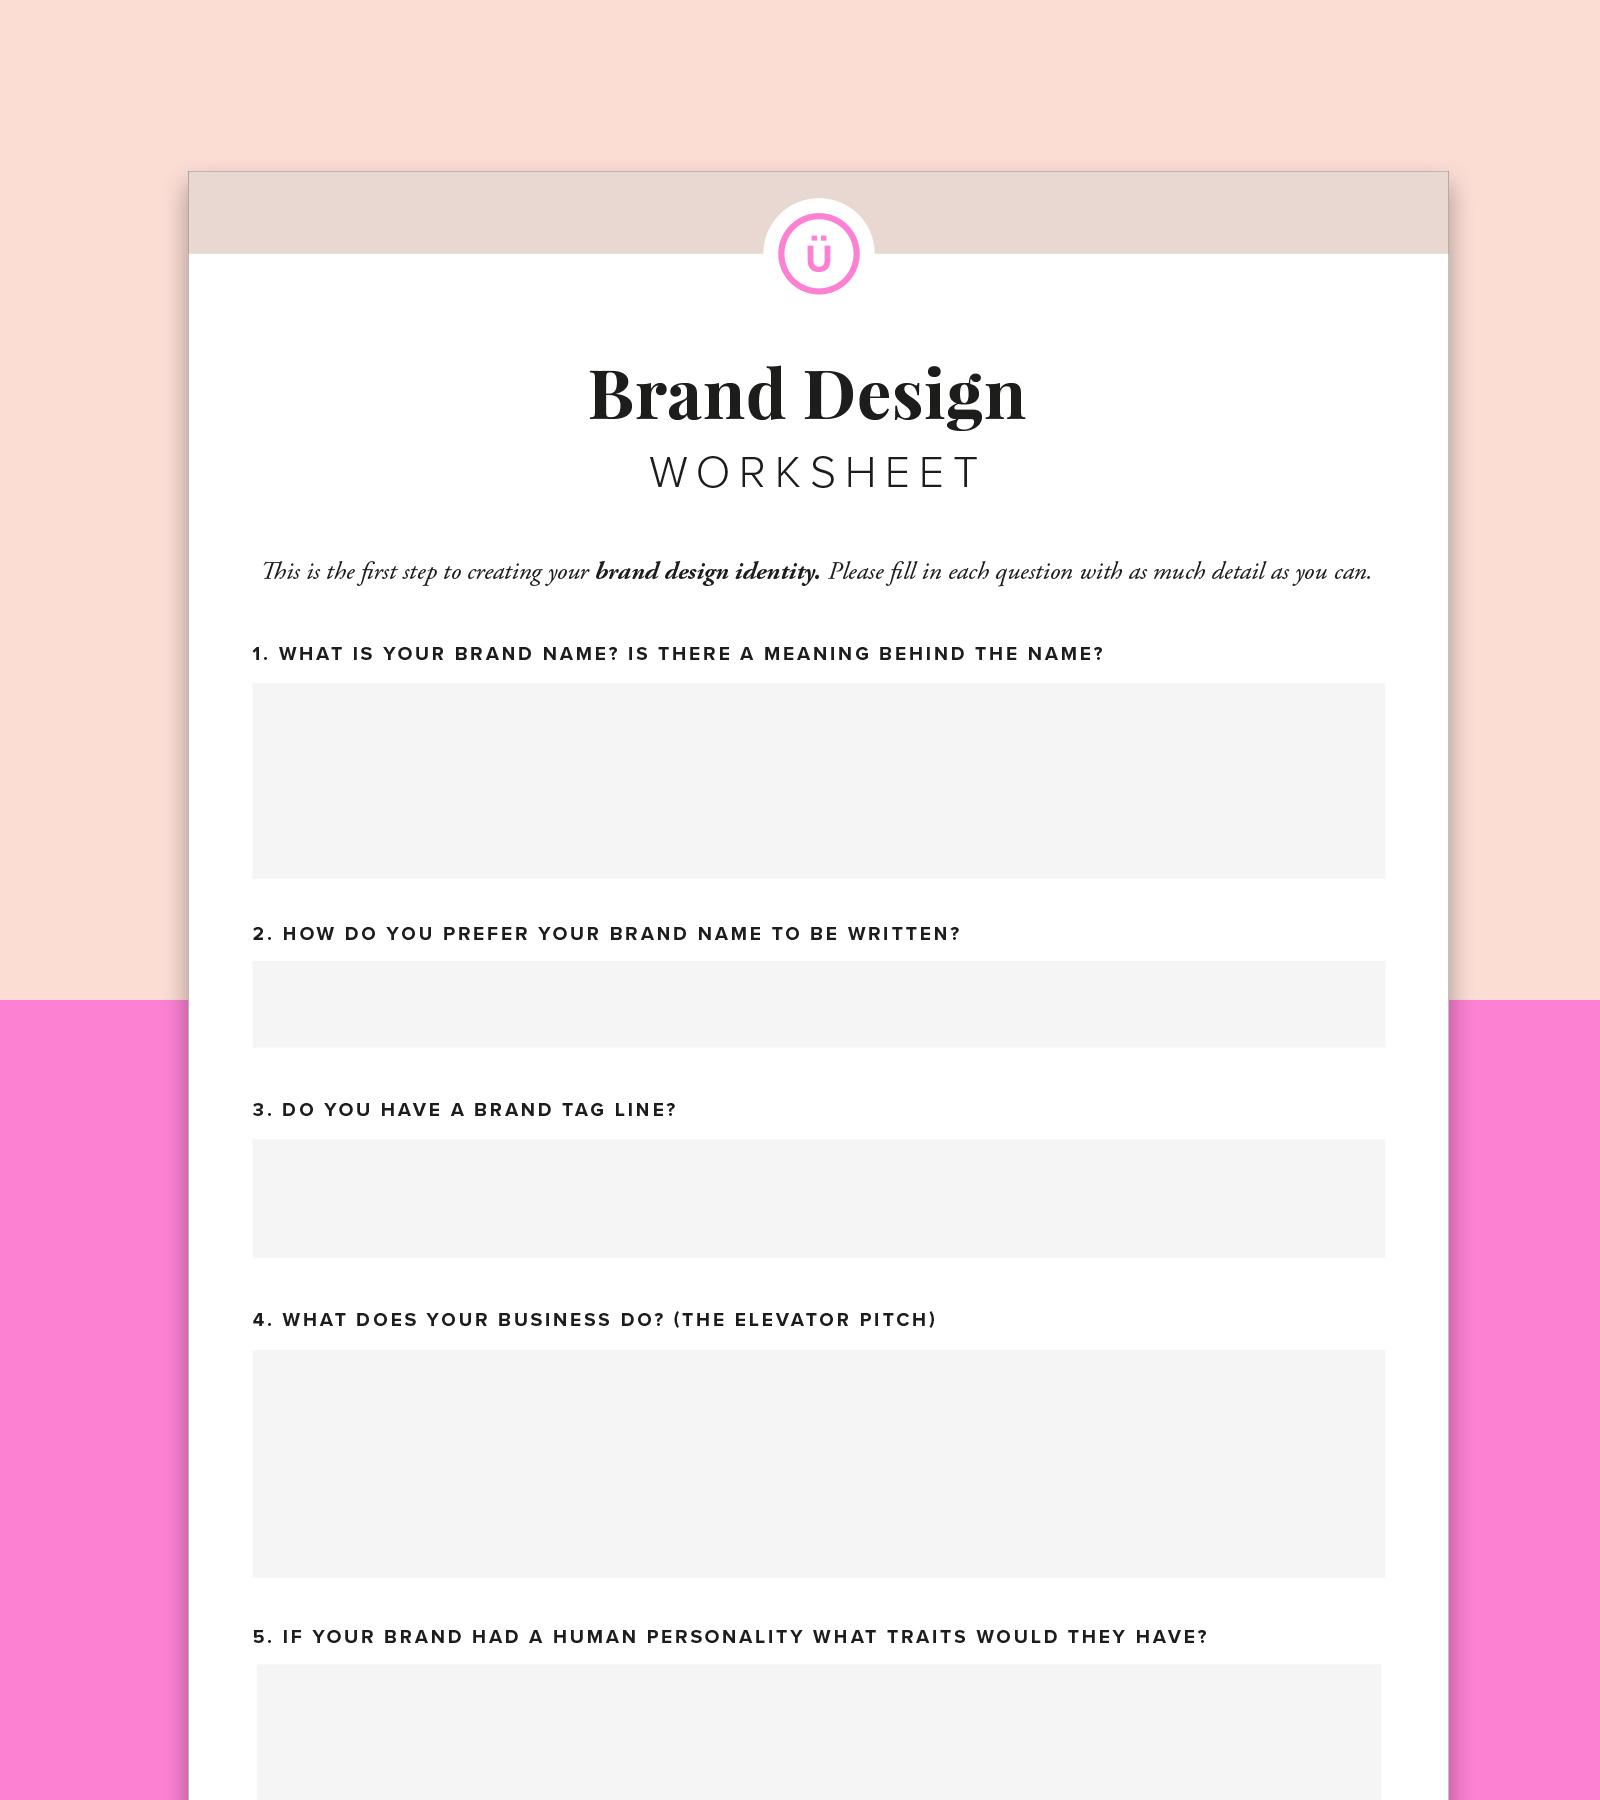 brand identity design WORKSHEET